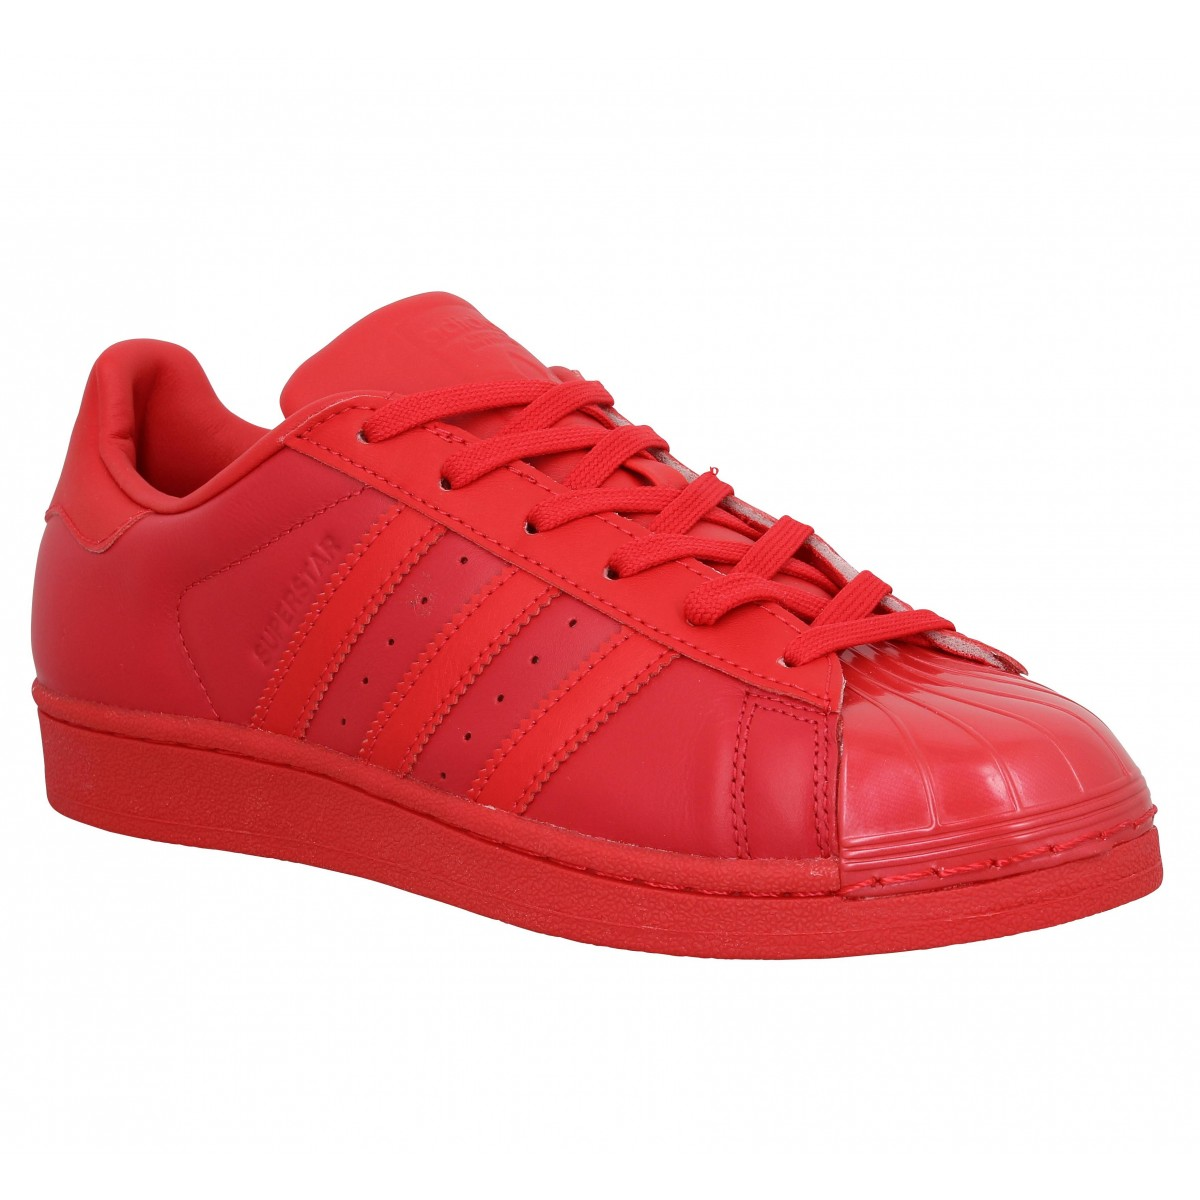 adidas original superstar femme rouge